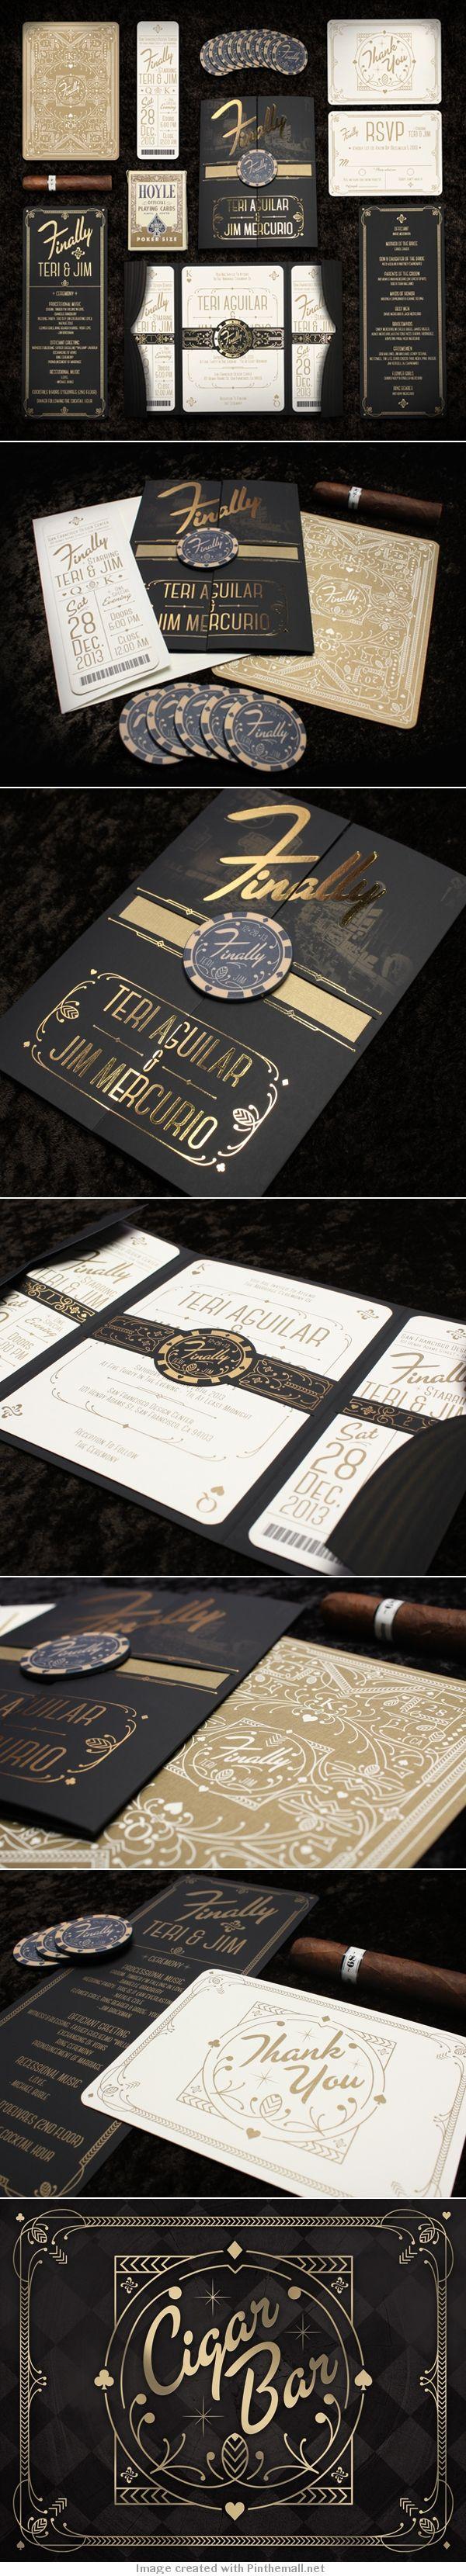 Mercurio Wedding Invitations - Anthony Gregg via Behance #wbd